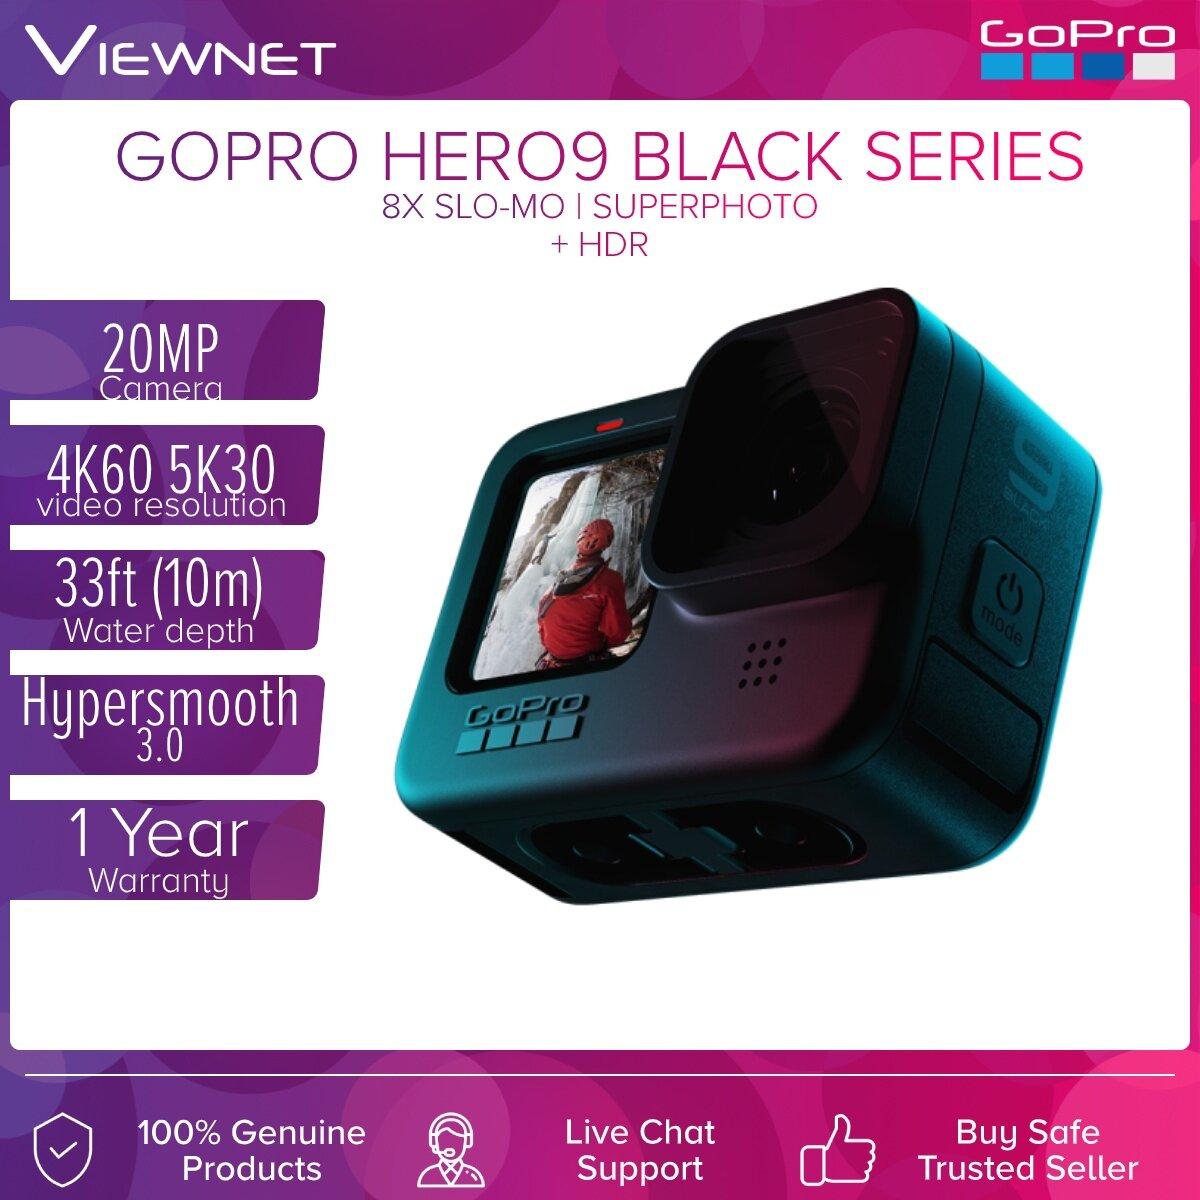 GOPRO HERO 9 Black / HERO 9 / Hero9 / HERO 9 BUNDLE 5K Video 20MP Streaming Camera Built-In Mounting with Folding Fingers  HERO9 Black Mods Compatibility 1 Year Warranty